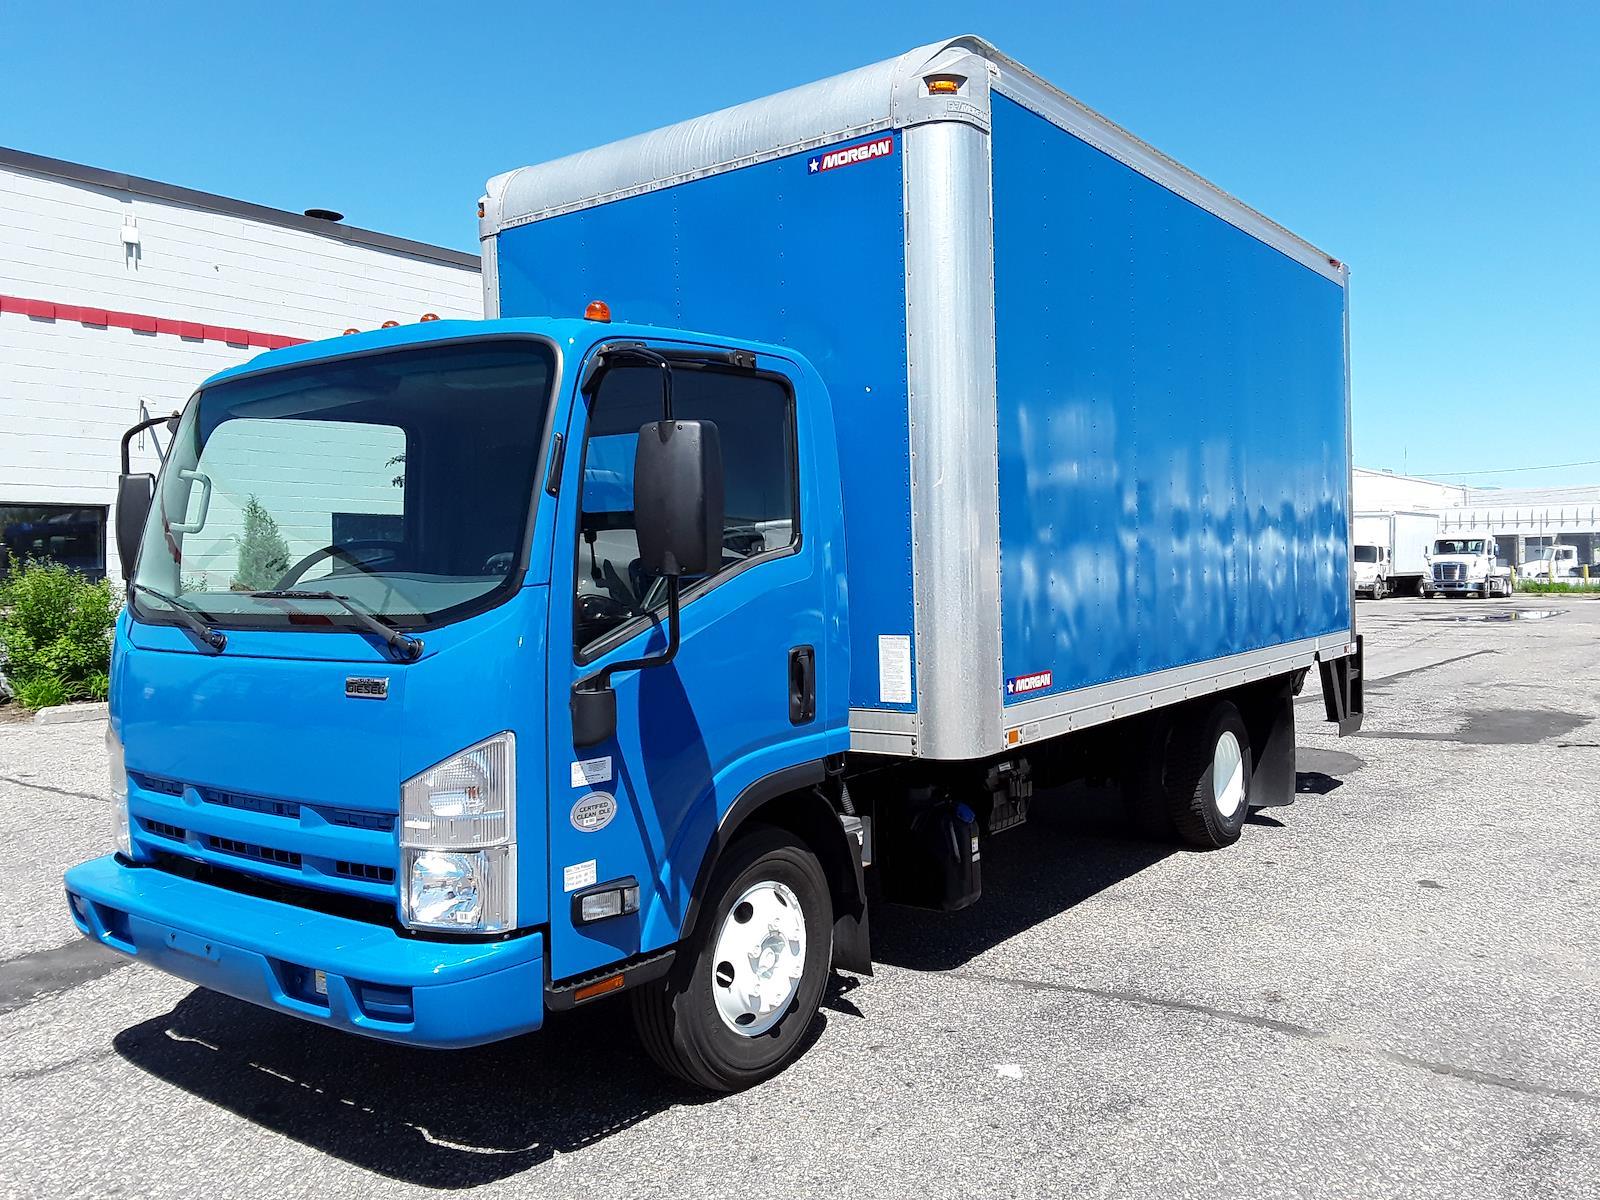 2015 Isuzu NPR-HD Regular Cab 4x2, Dry Freight #327143 - photo 1